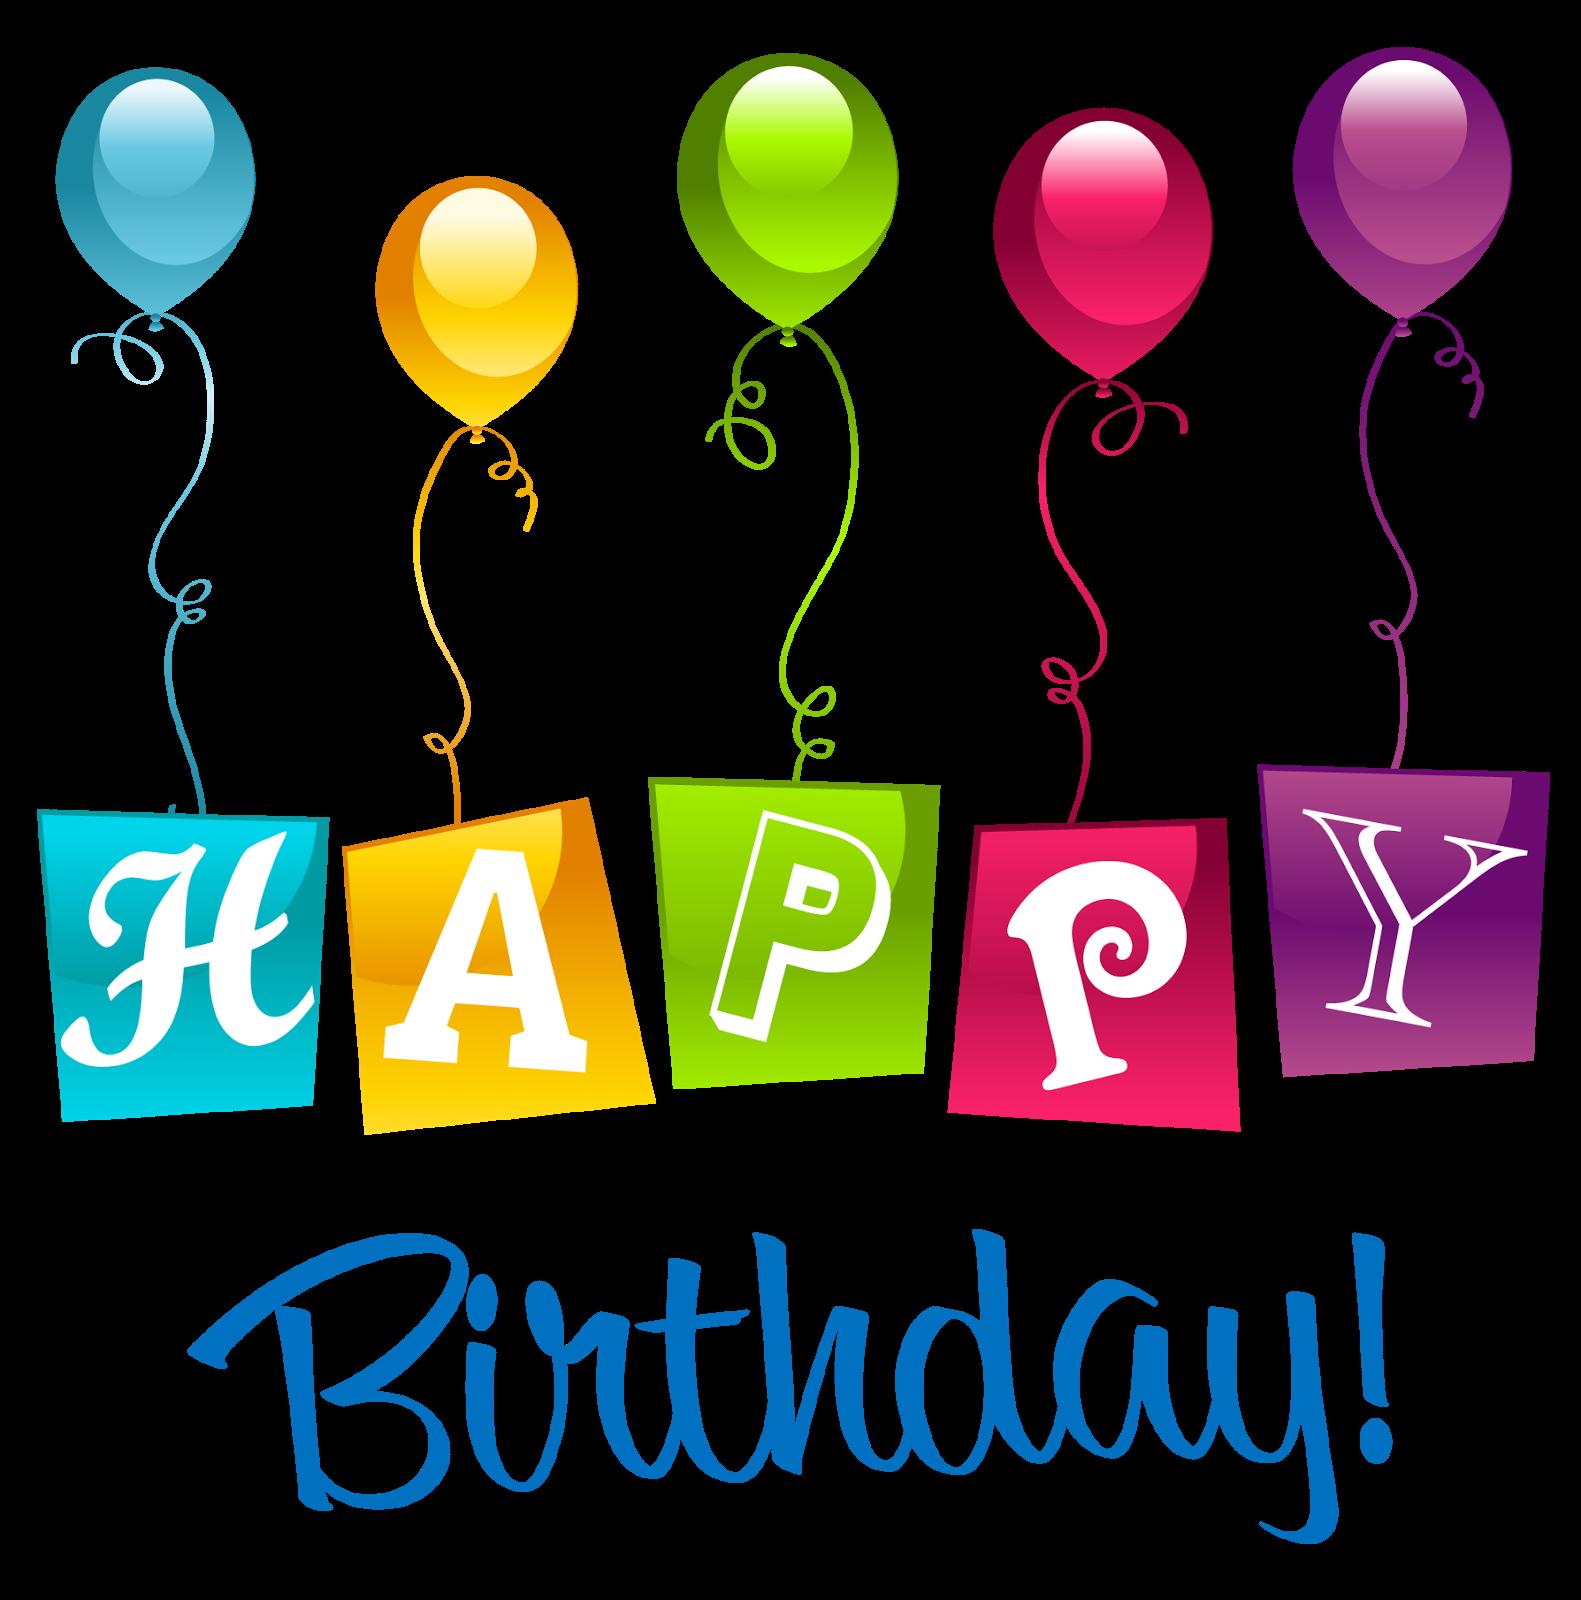 printable birthday clipart at getdrawings com free for personal rh getdrawings com clipart for birthday celebration clipart for birthday cakes